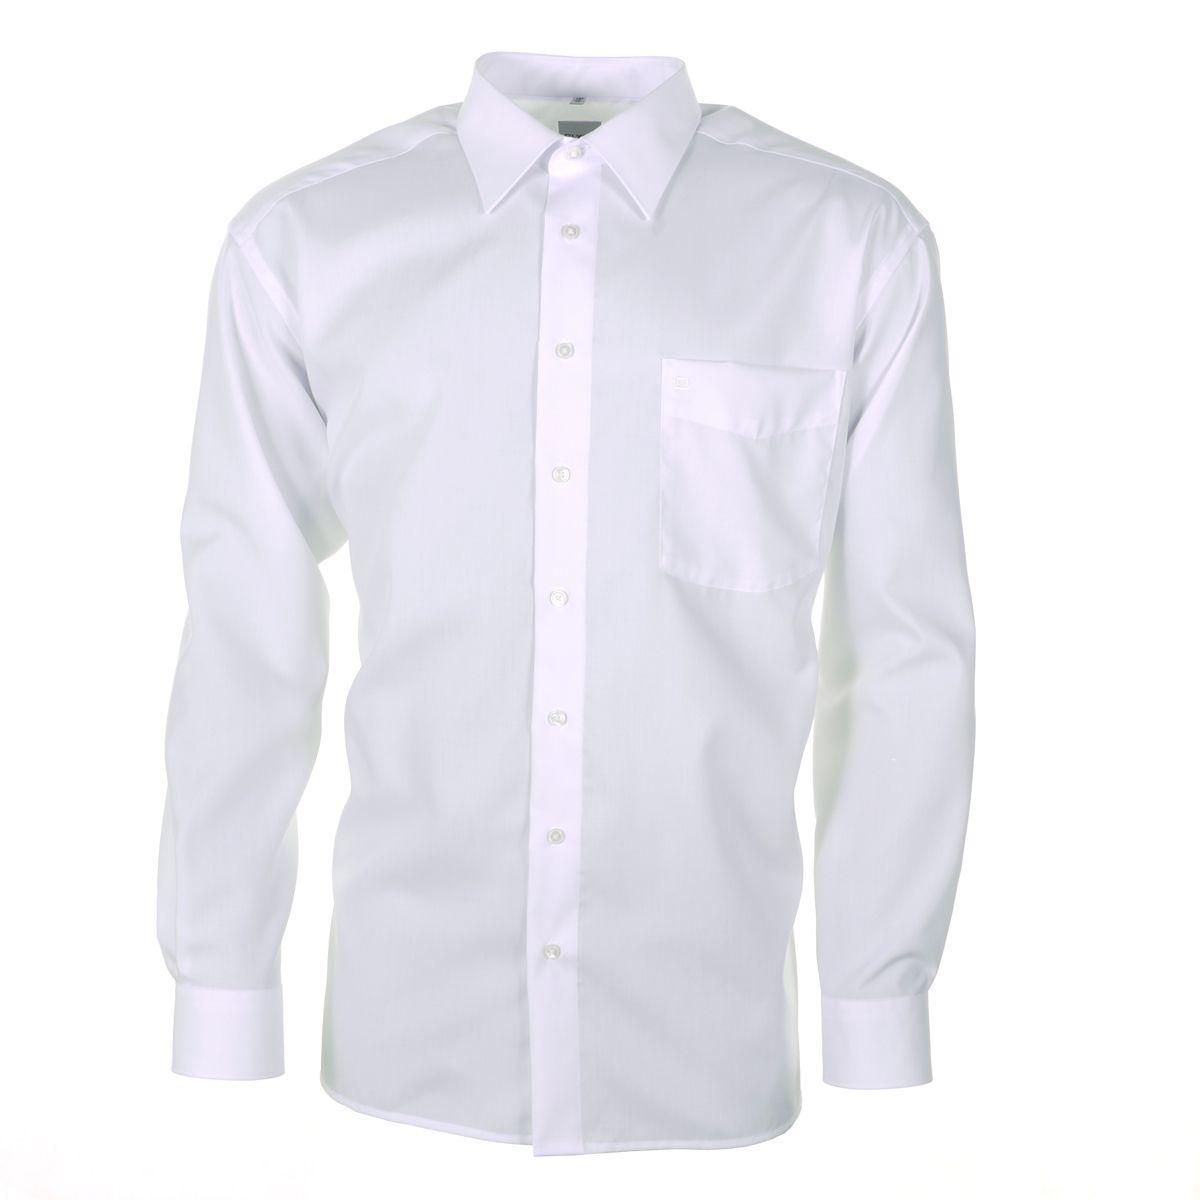 recherche chemise blanche femme Nanterre